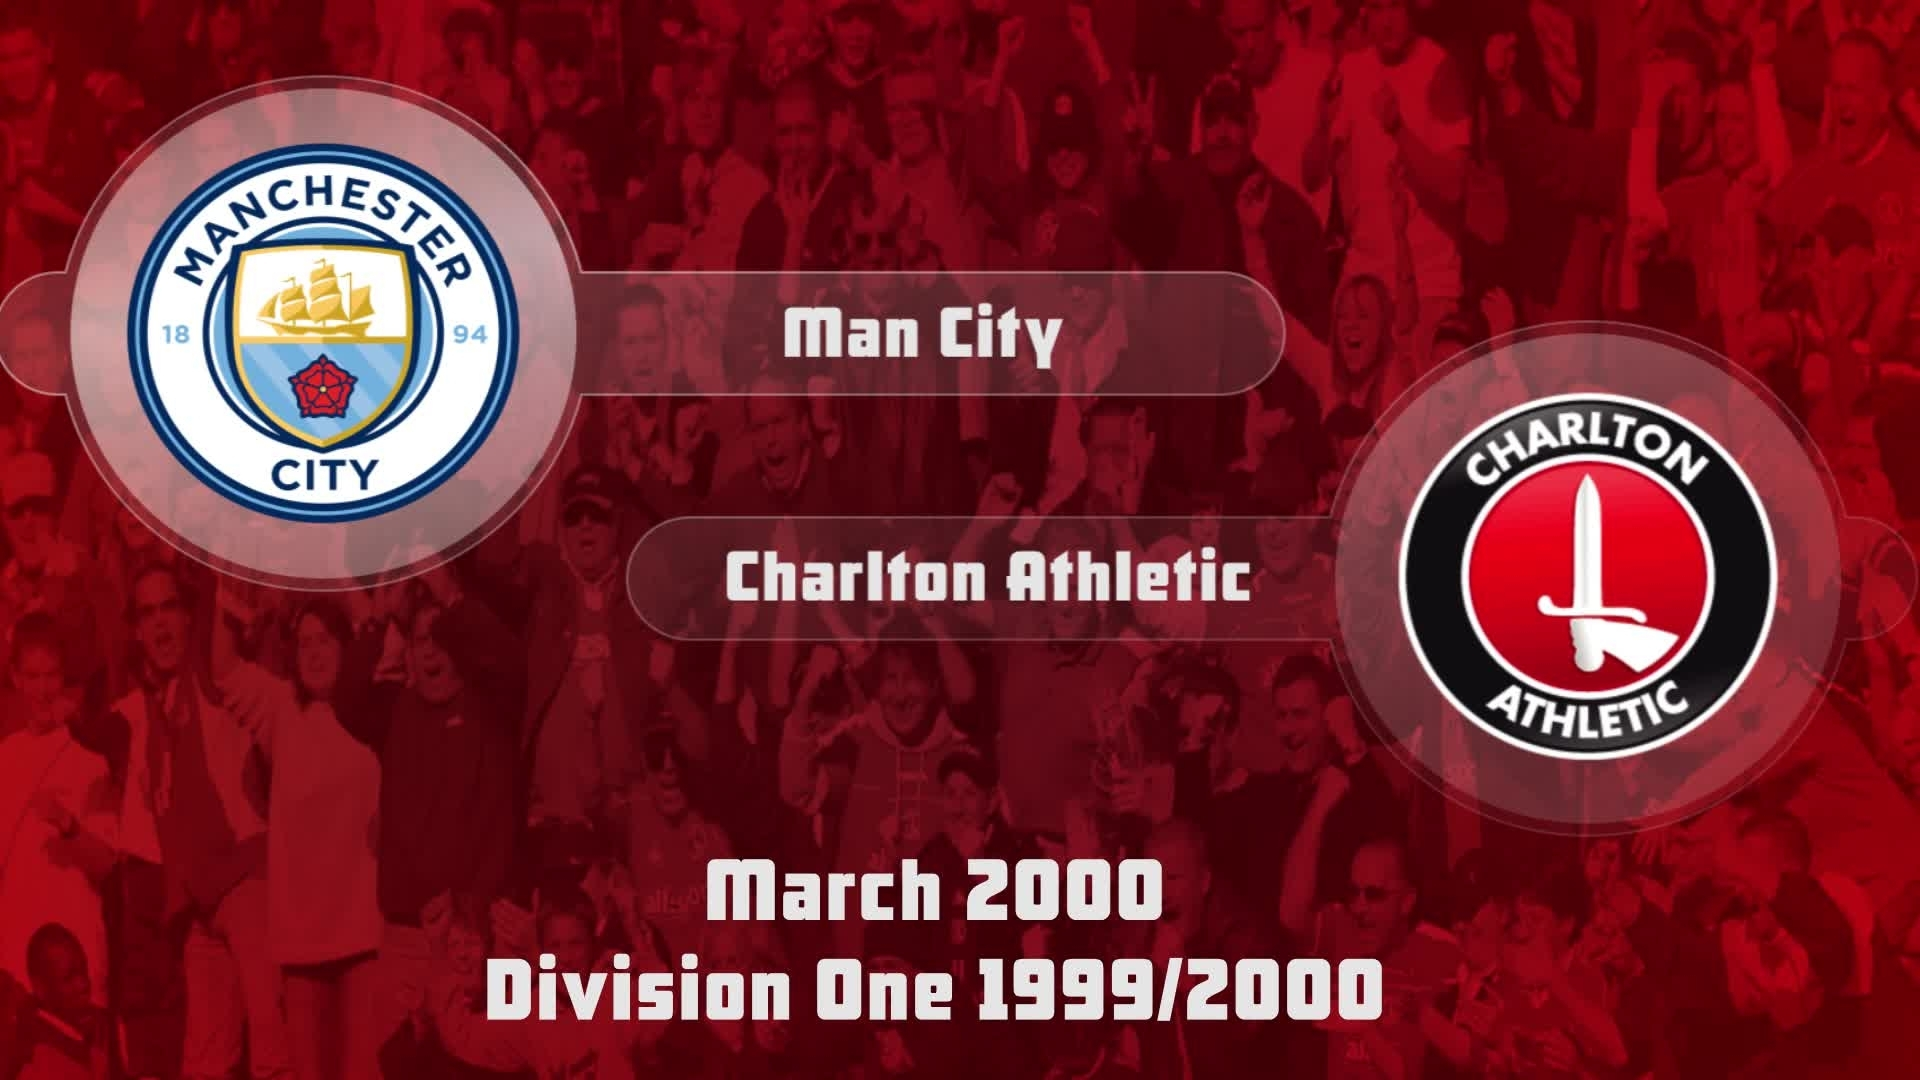 42 HIGHLIGHTS | Man City 1 Charlton 1 (March 2000)